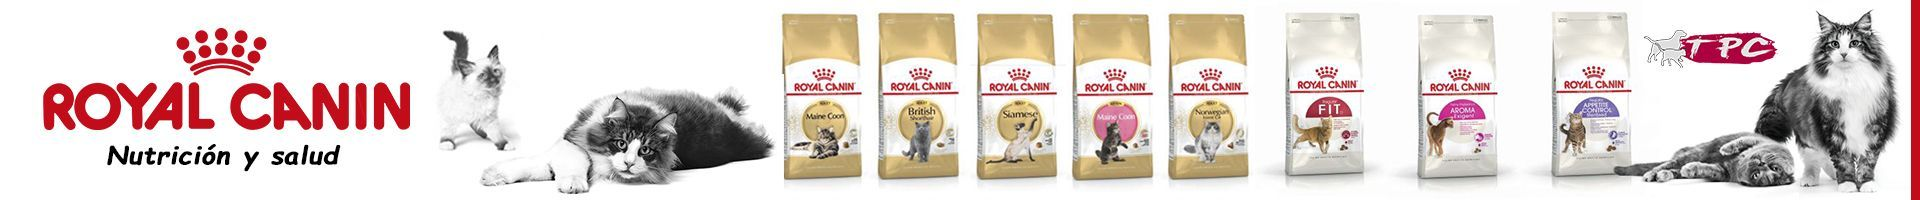 RoyalCanin piensos gatos tenerife TelepiensosCanarias 6 5 2018 170851